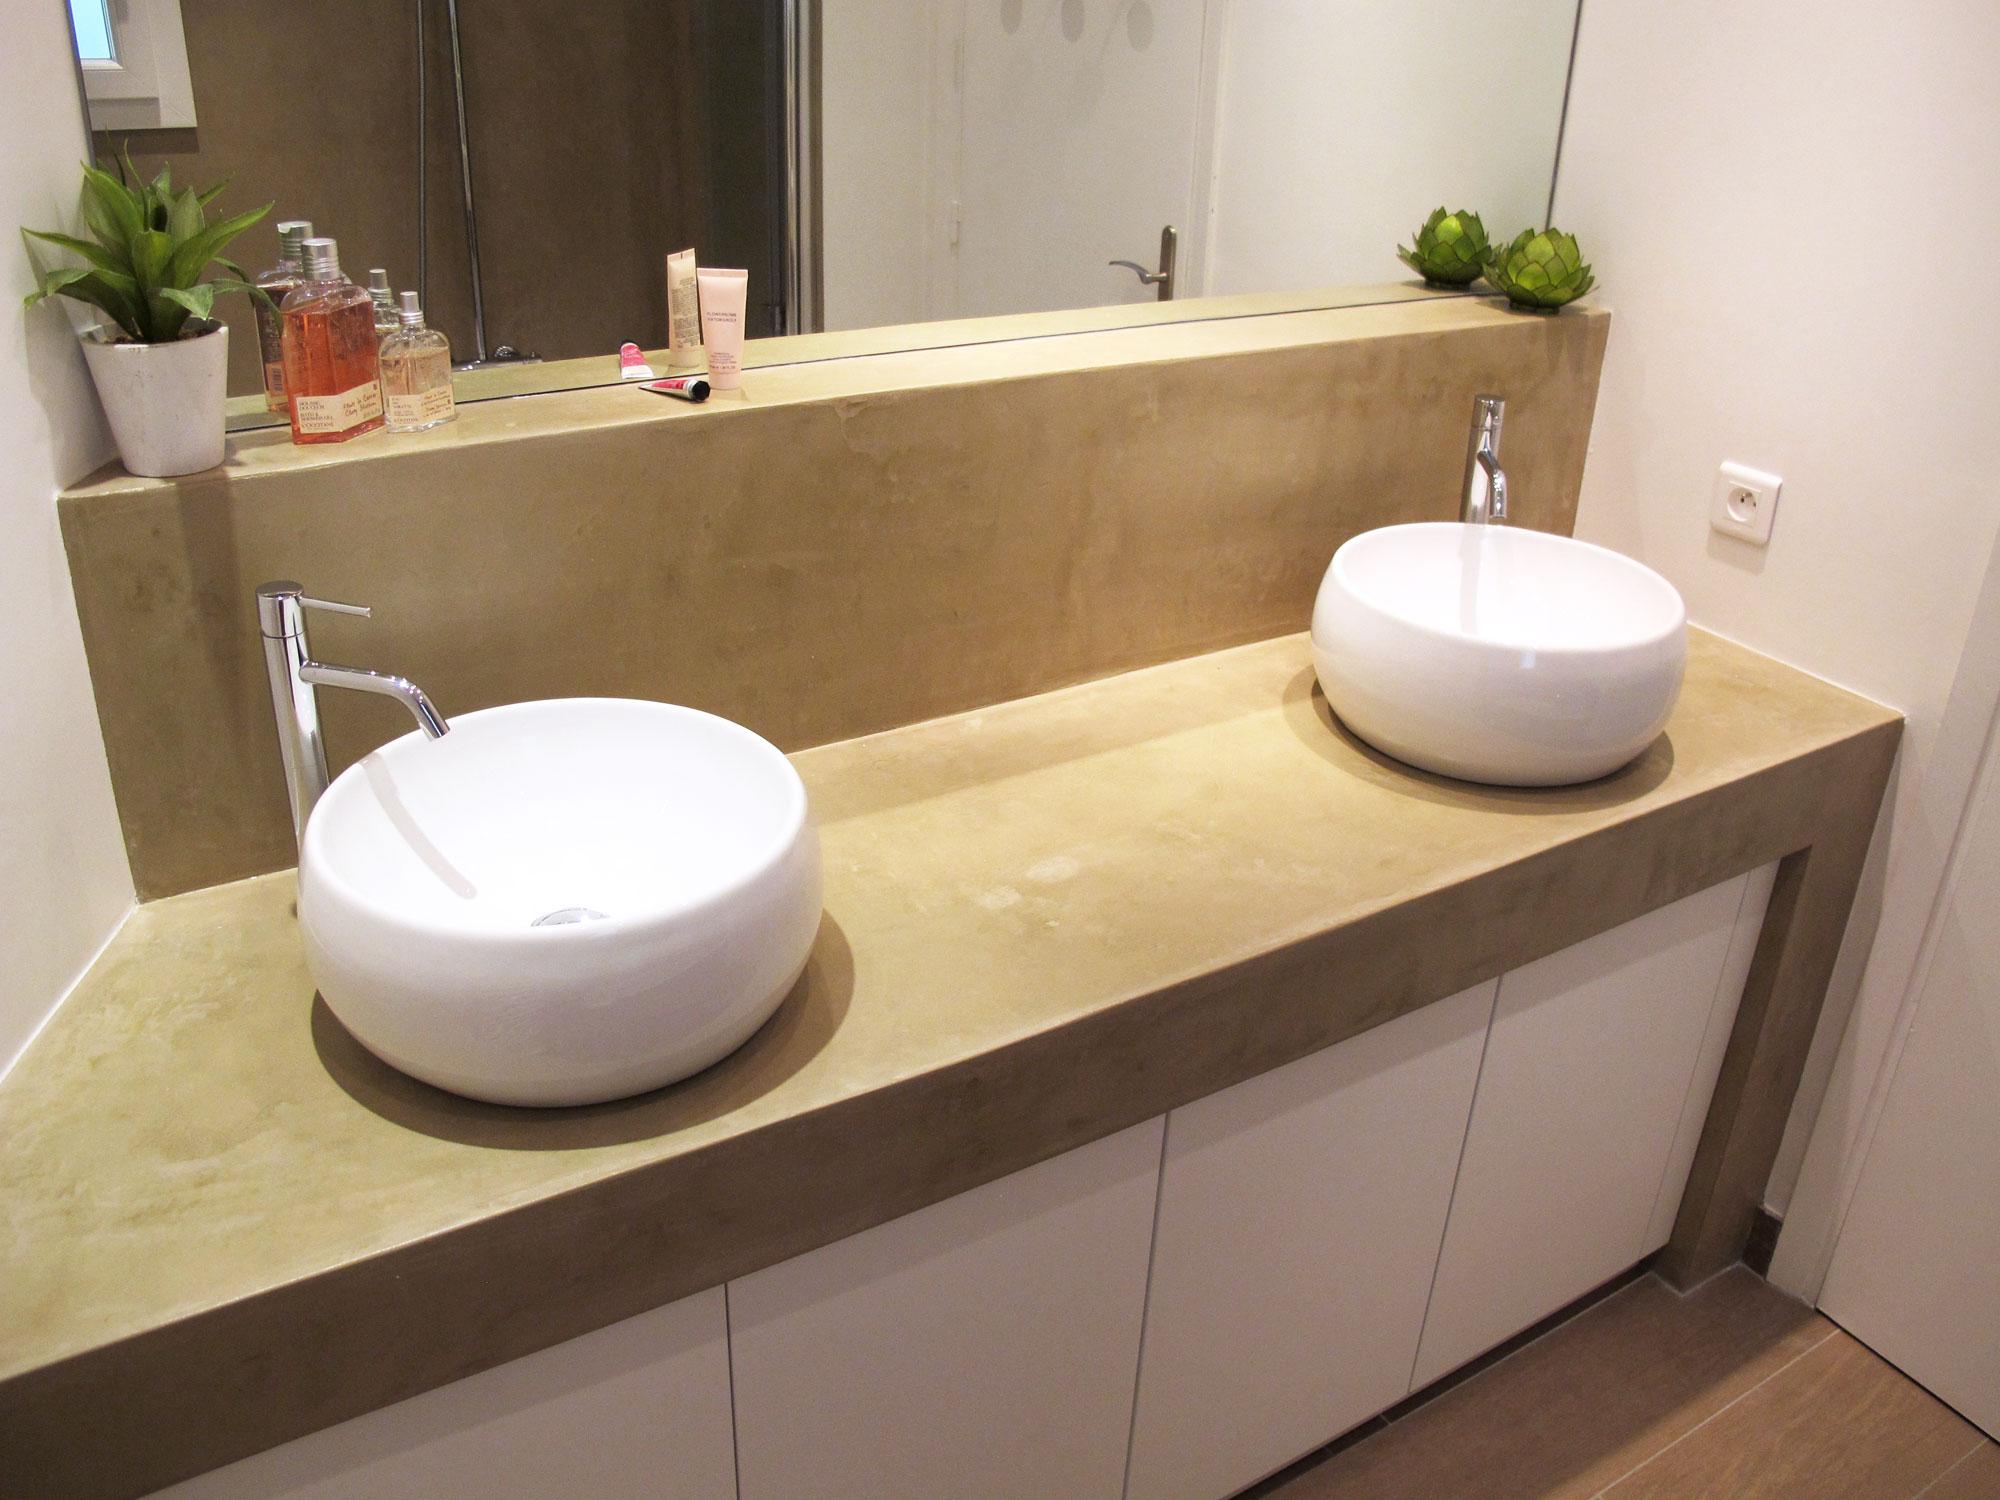 Meuble En Béton Ciré salle de bain - béton ciré et carrelage parquet